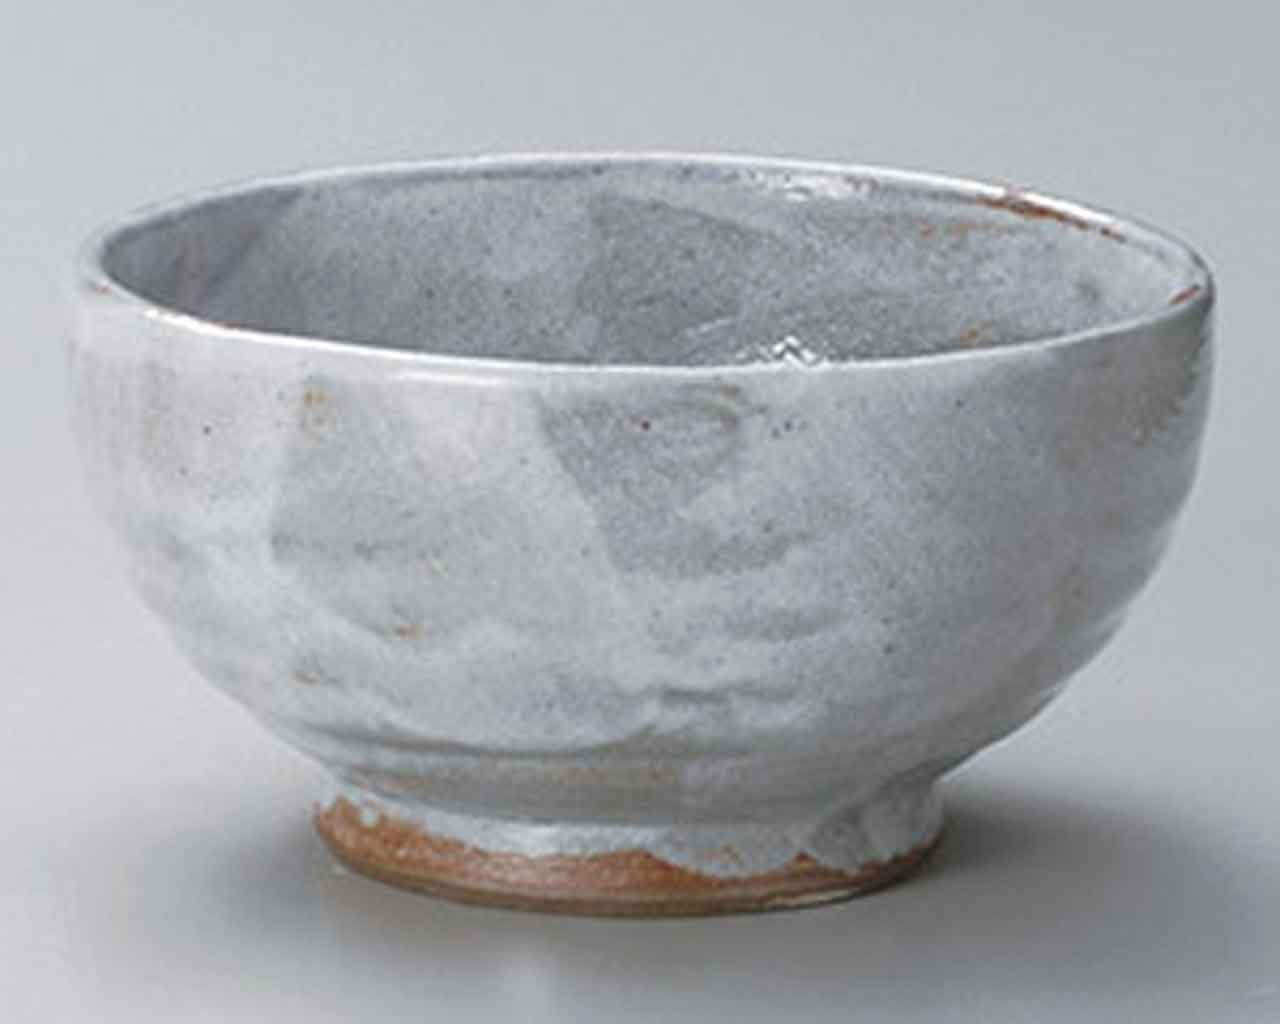 Akemurasaki 6.7inch Set of 10 Ramen-Bowls Grey Ceramic Made in Japan